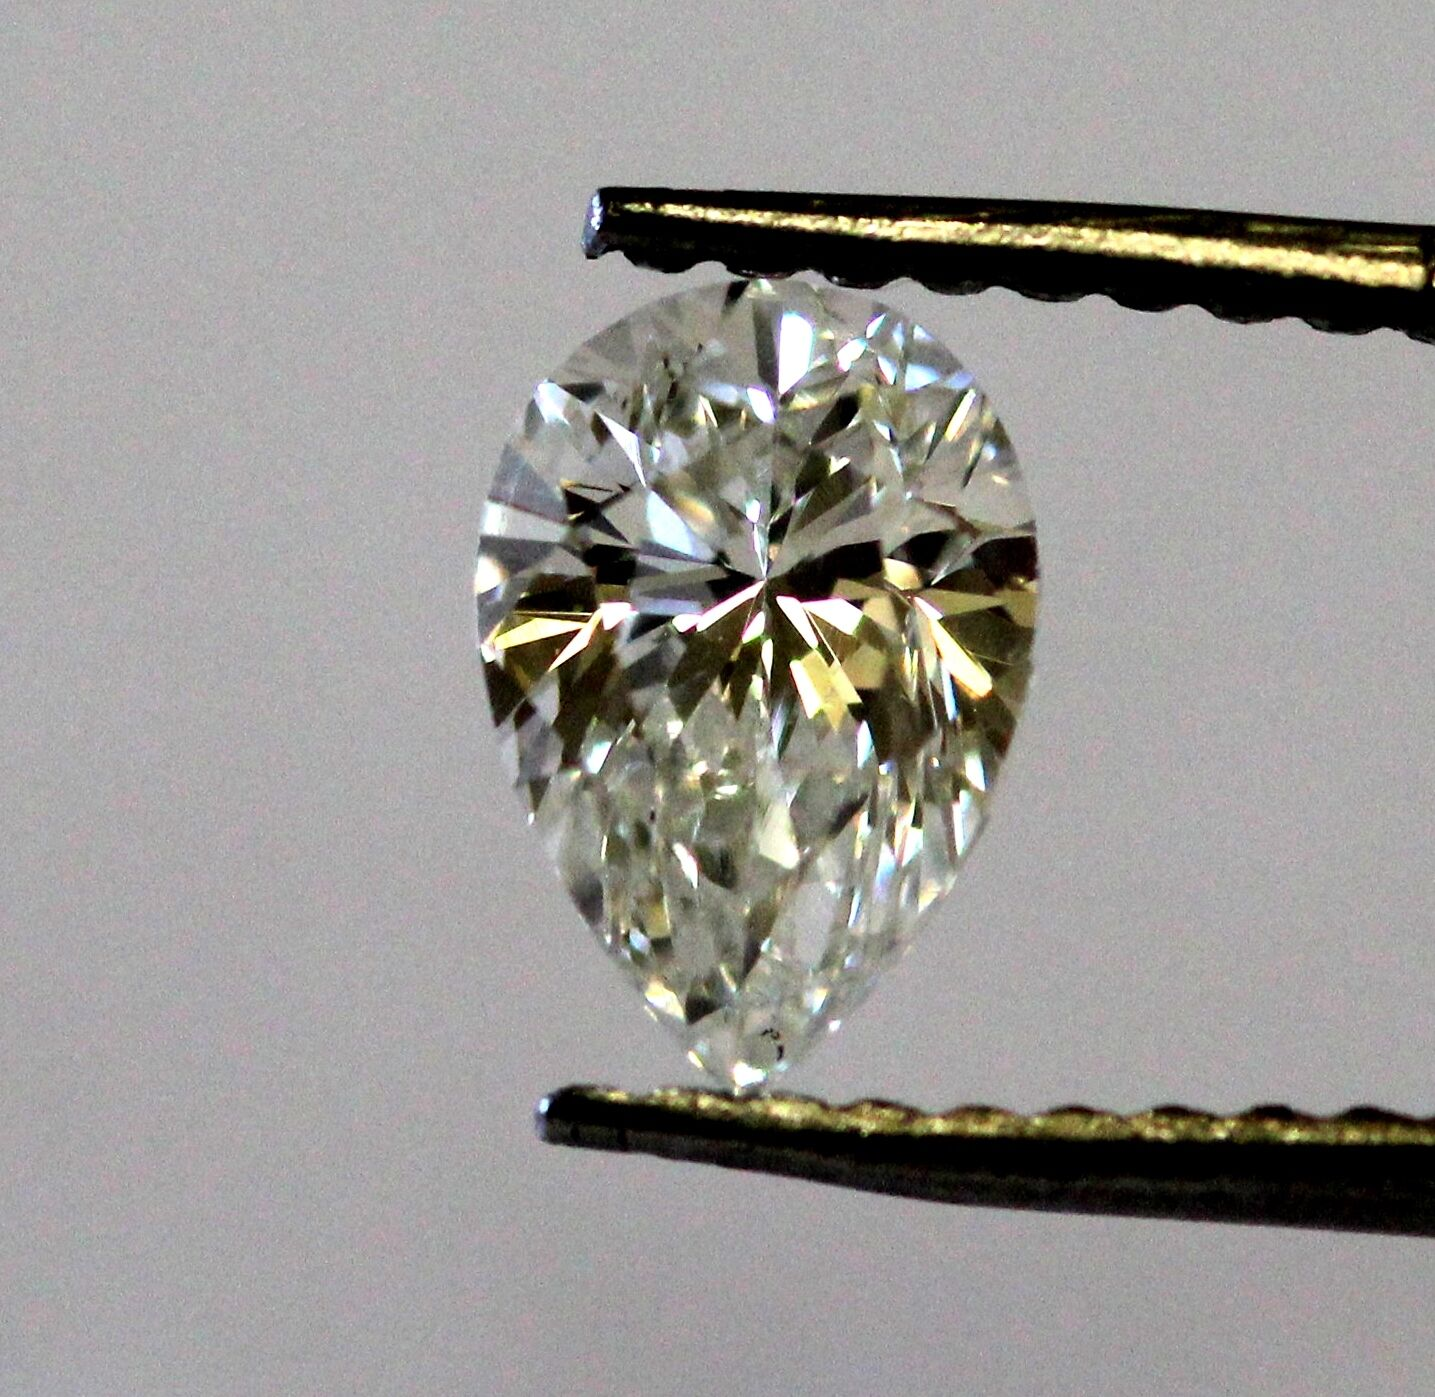 .70ct pear cut loose diamond GIA Certified SI1 J 6.73 X 4.61 X 3.31 MM vintage